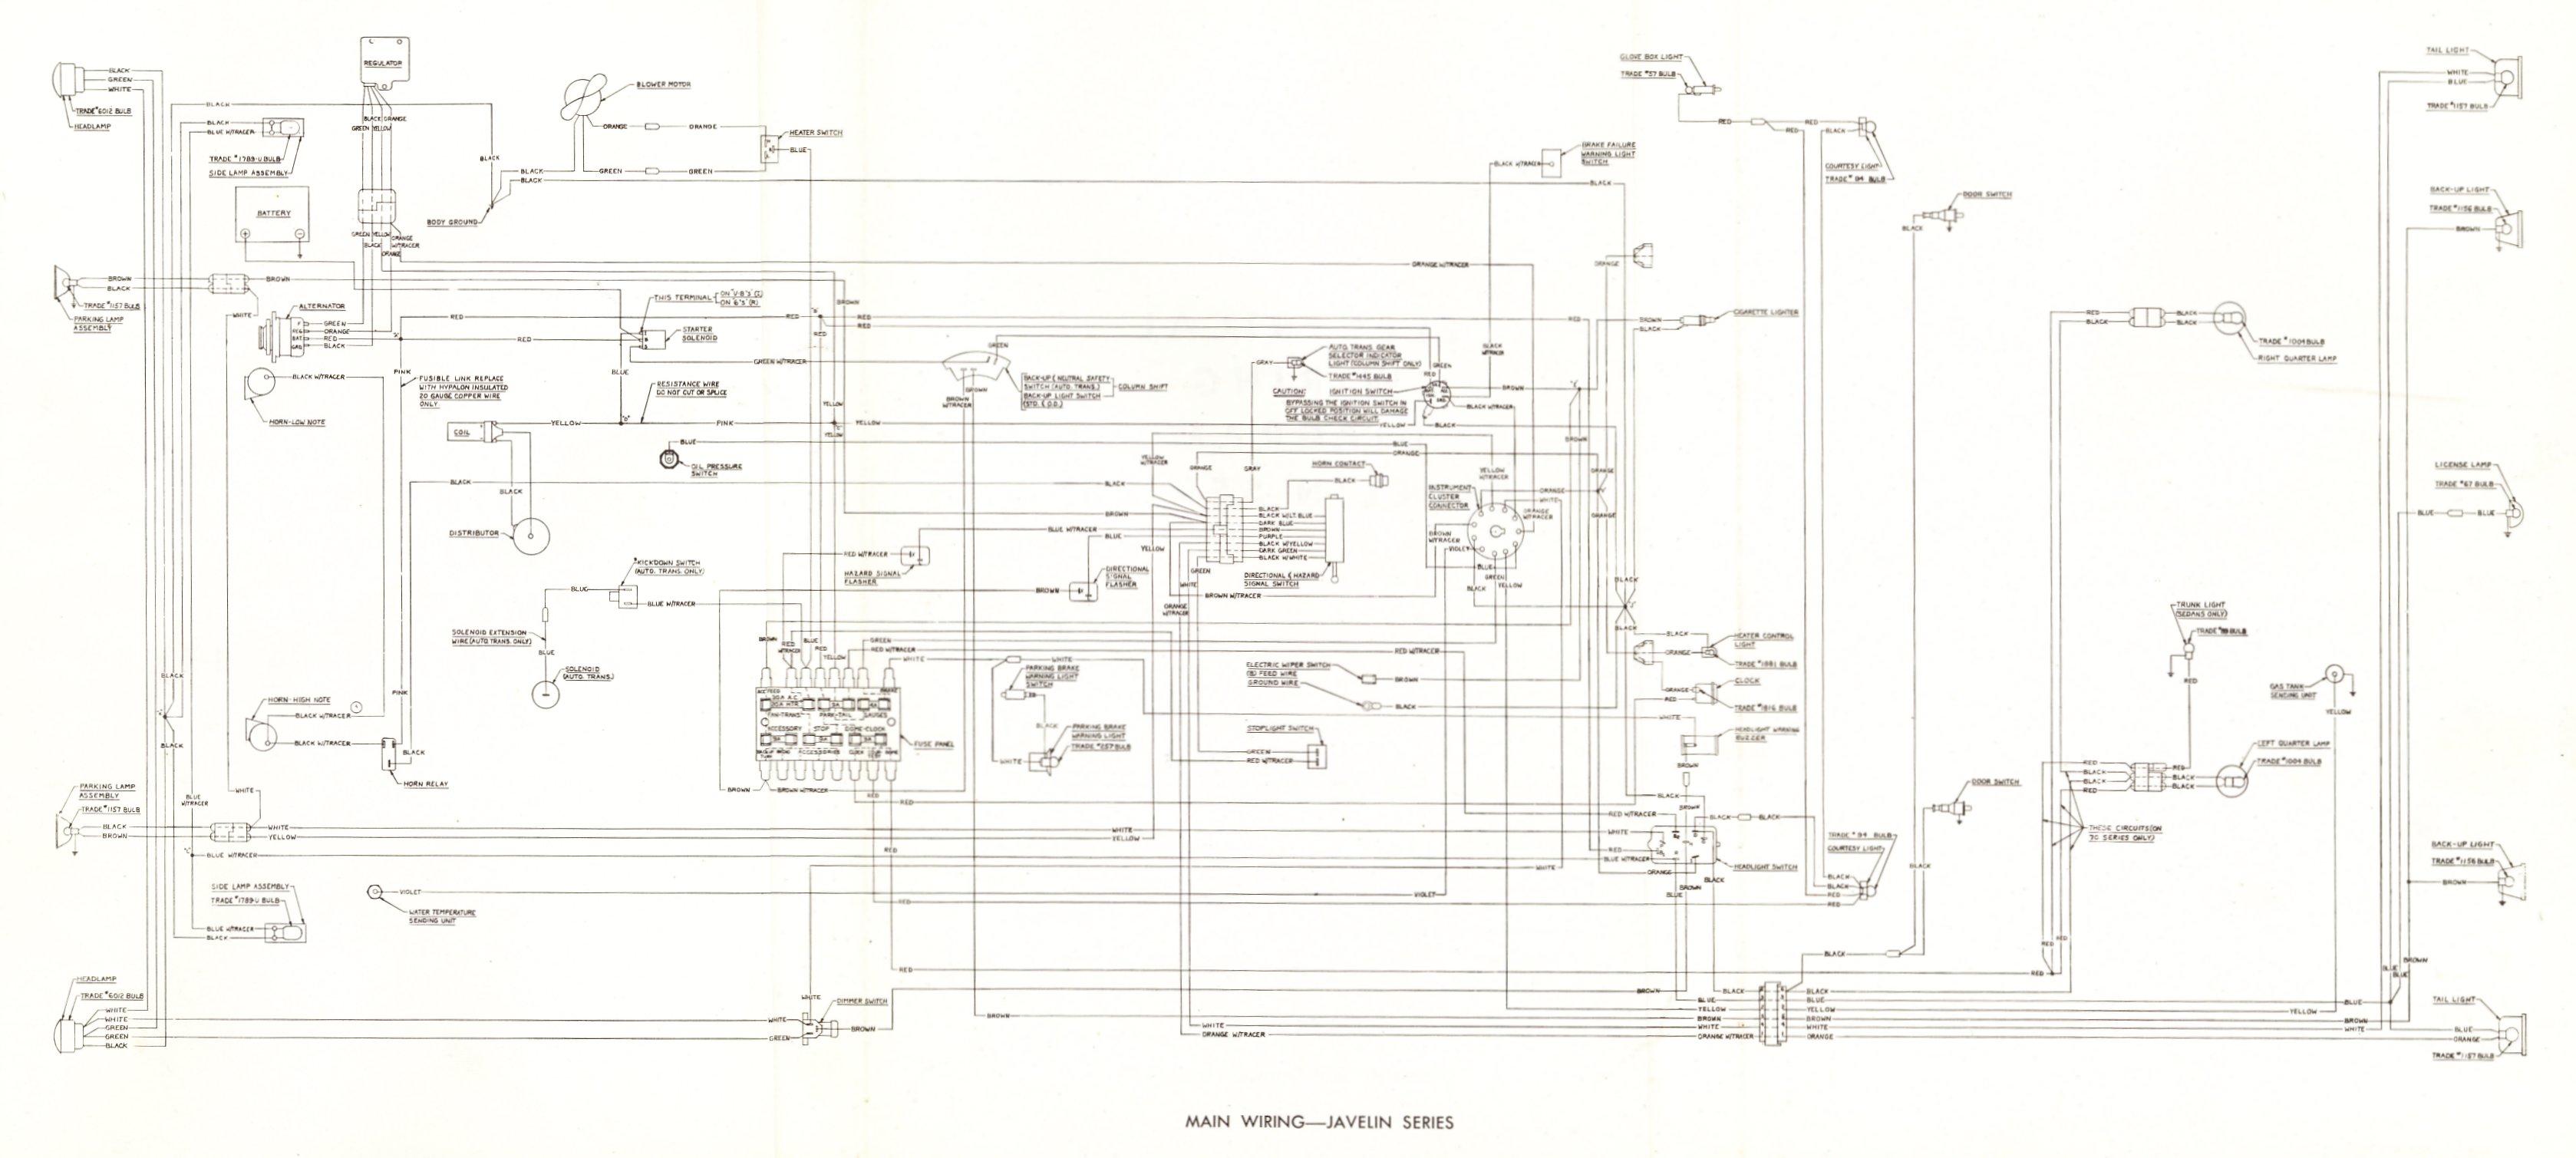 OR_3066] Amc Javelin Wiring Diagram Amc 304 Vacuum Line Diagrams Amc  Javelin Schematic WiringBios Vira Subd Lite Tixat Rosz Trons Mohammedshrine Librar Wiring 101